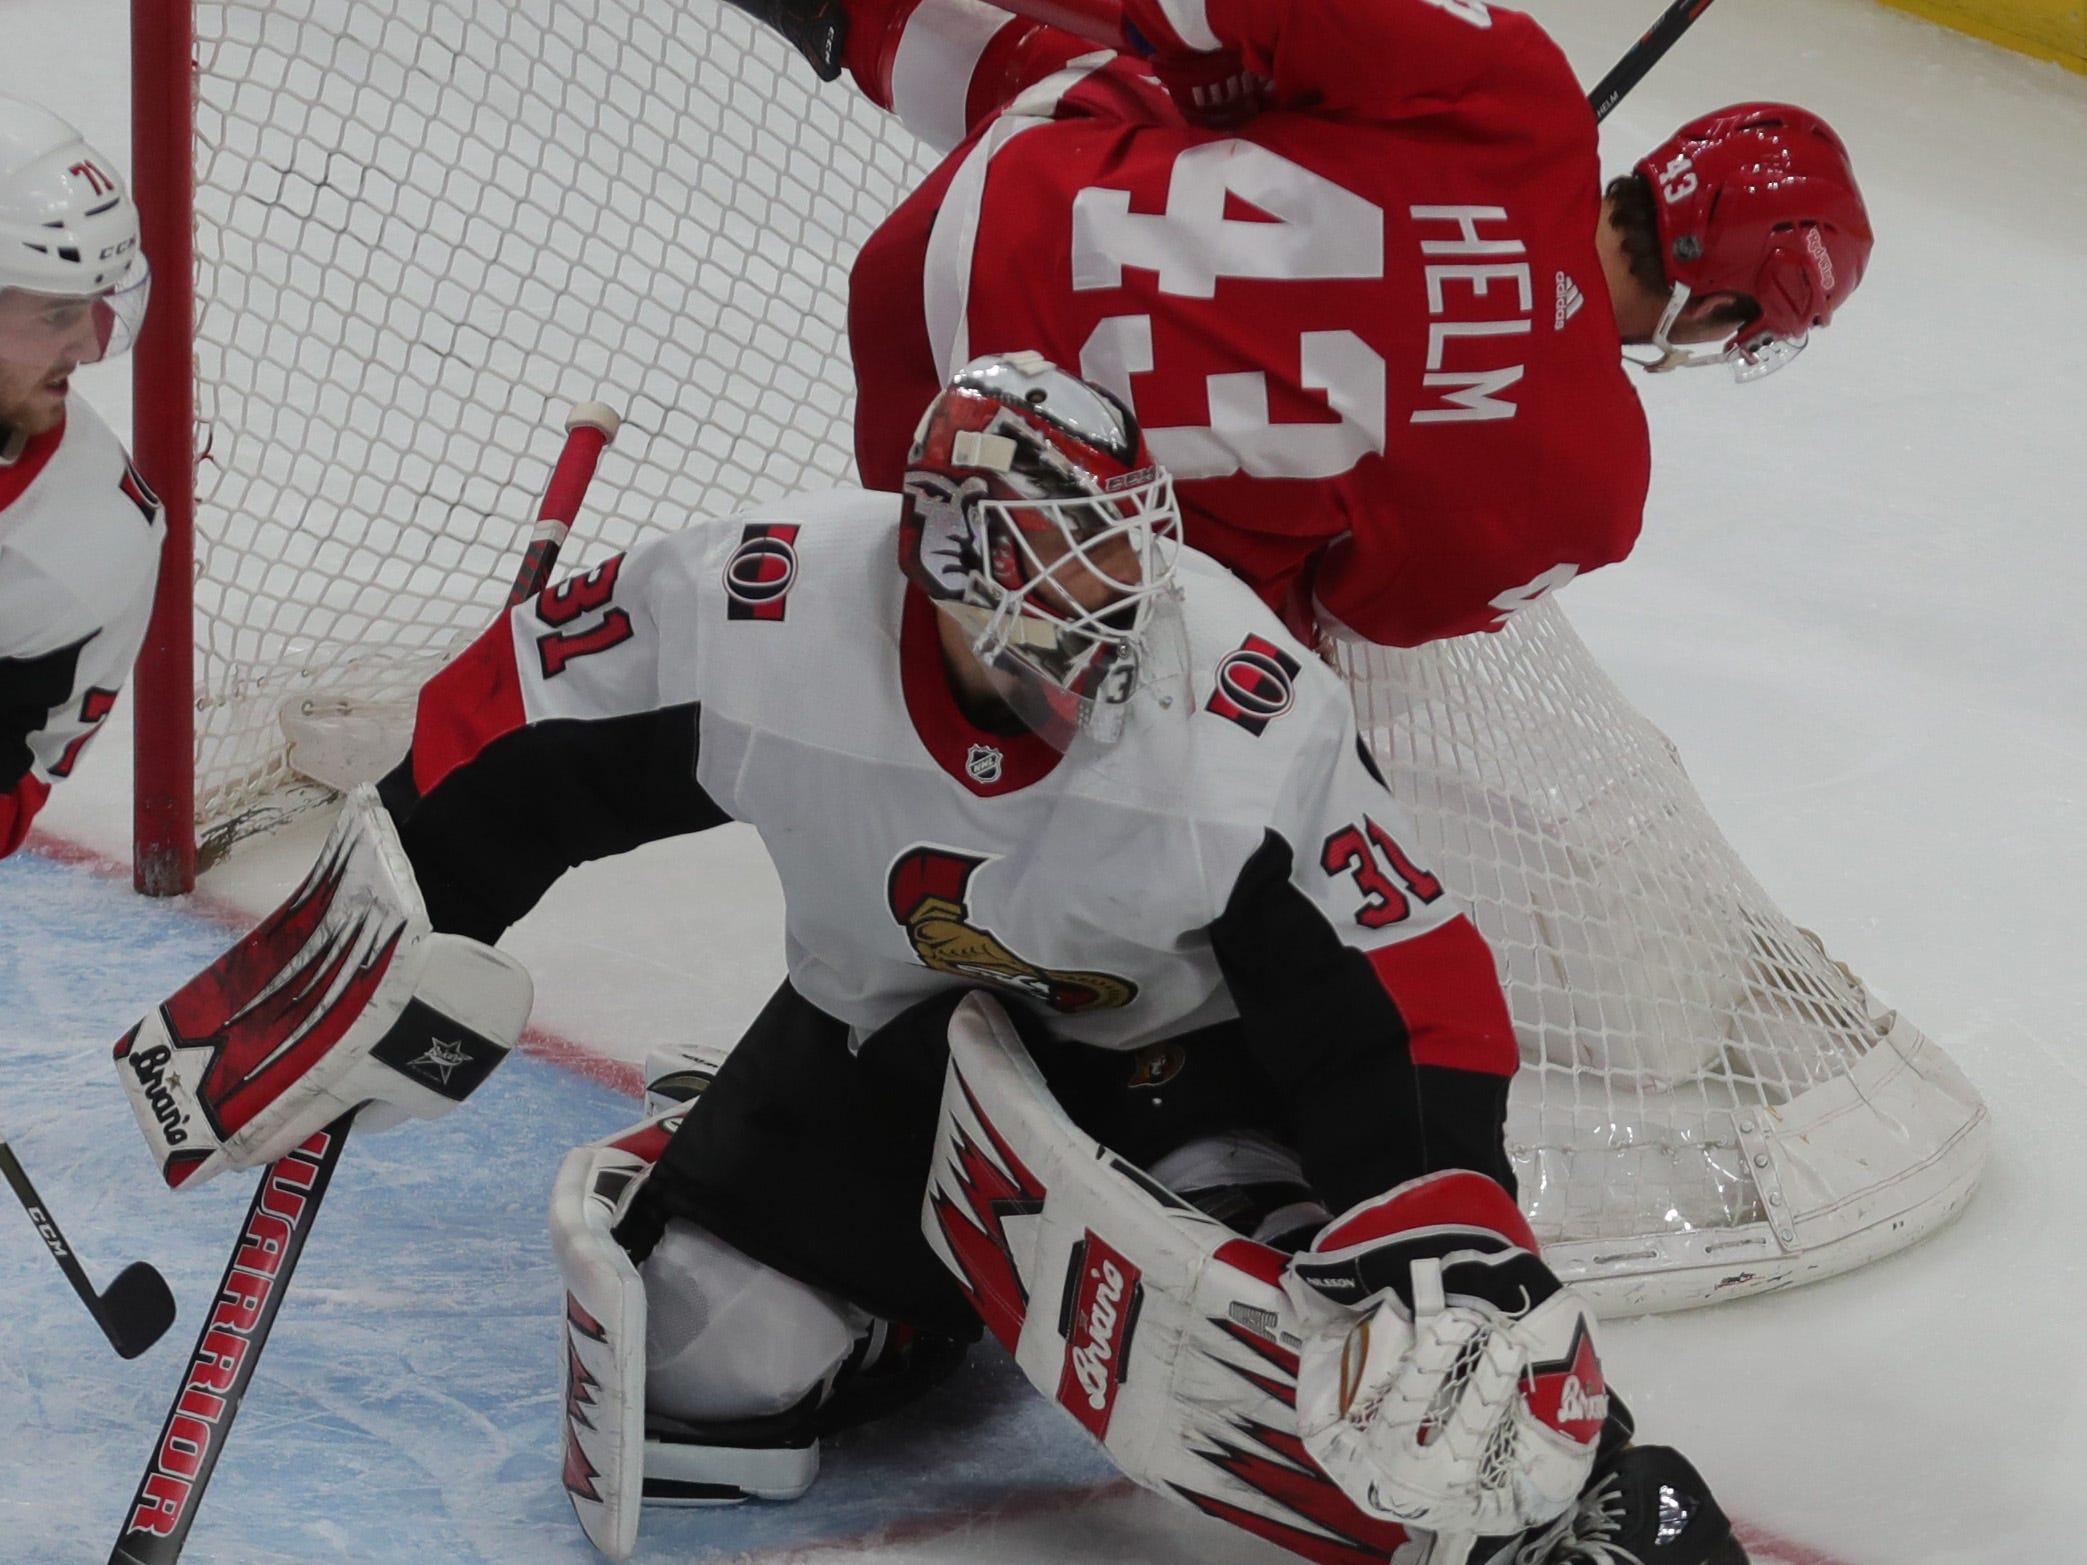 Red Wings forward Darren Helm is checked into Ottawa Senators goalie Anders Nilsson on Thursday in Detroit.